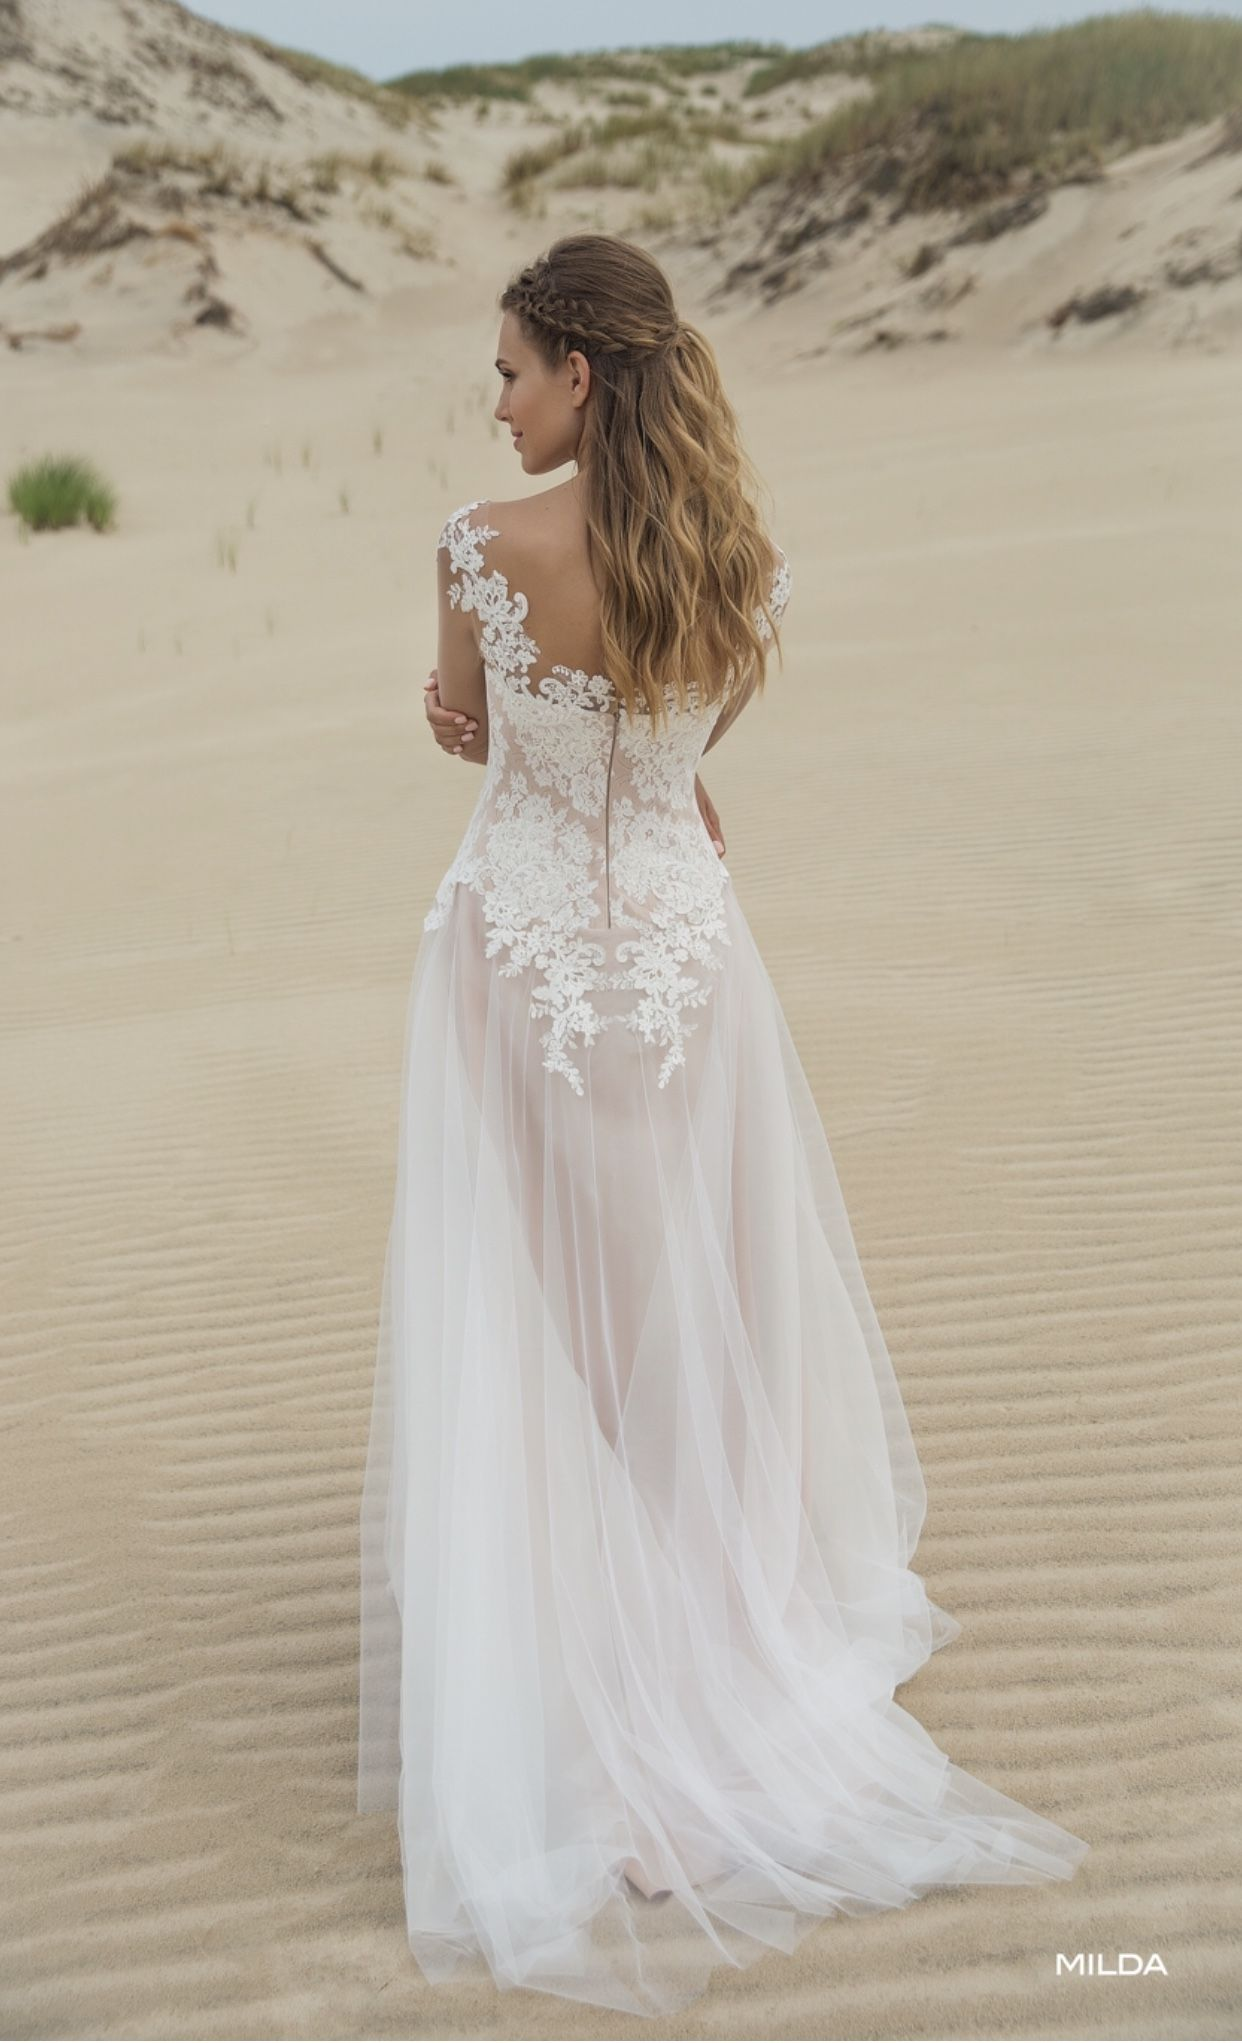 Boho Wedding dress Le Rina Milda -LIVAMOUR Brautmode  Kleid